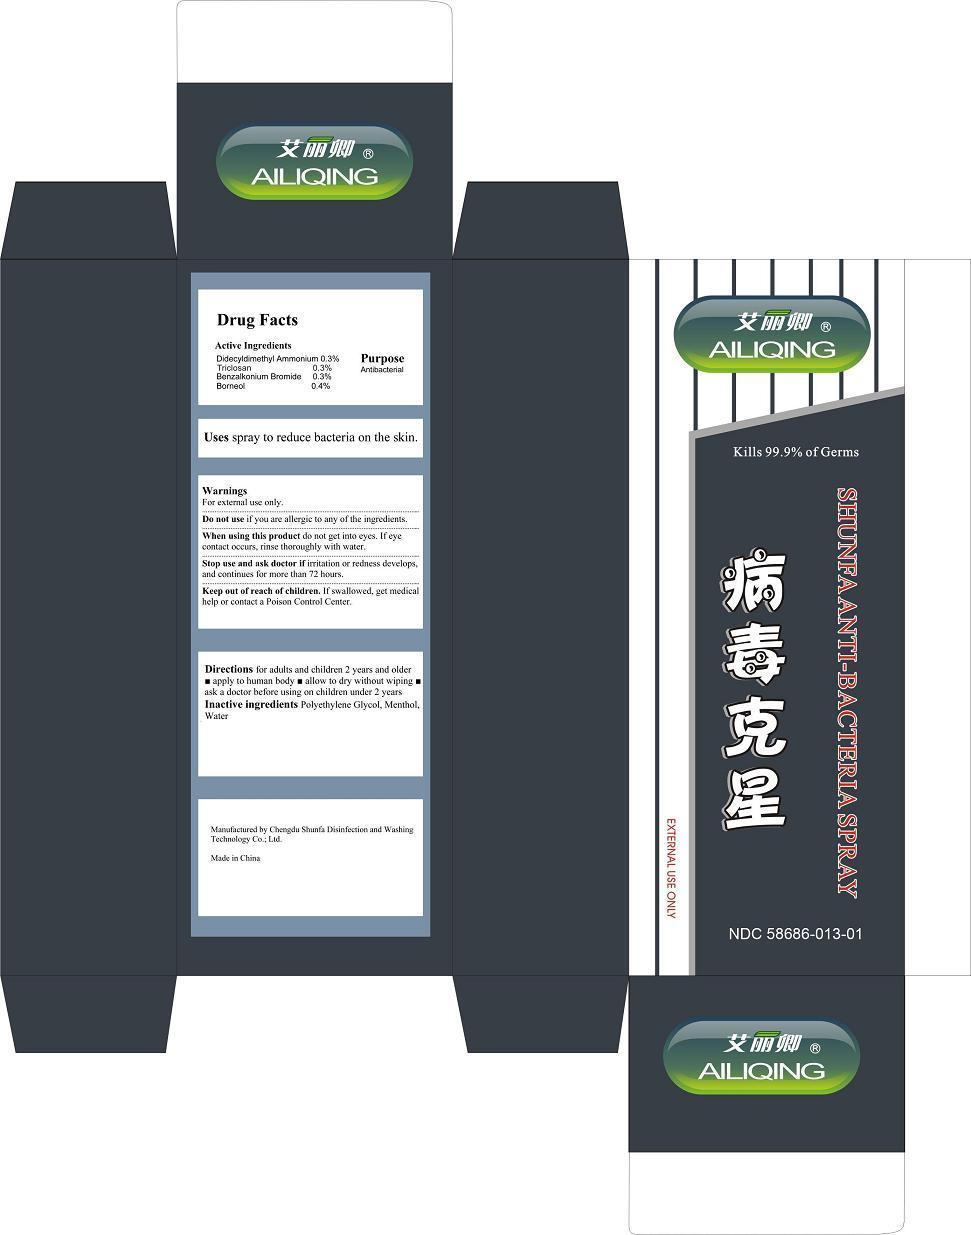 Shunfa Anti-bacteria Spra (Didecyldimethyl Ammonium,triclosan, Borneol, Benzalkonium Bromide) Spray [Chengdu Shunfa Disinfection And Washing Technology Co Ltd]